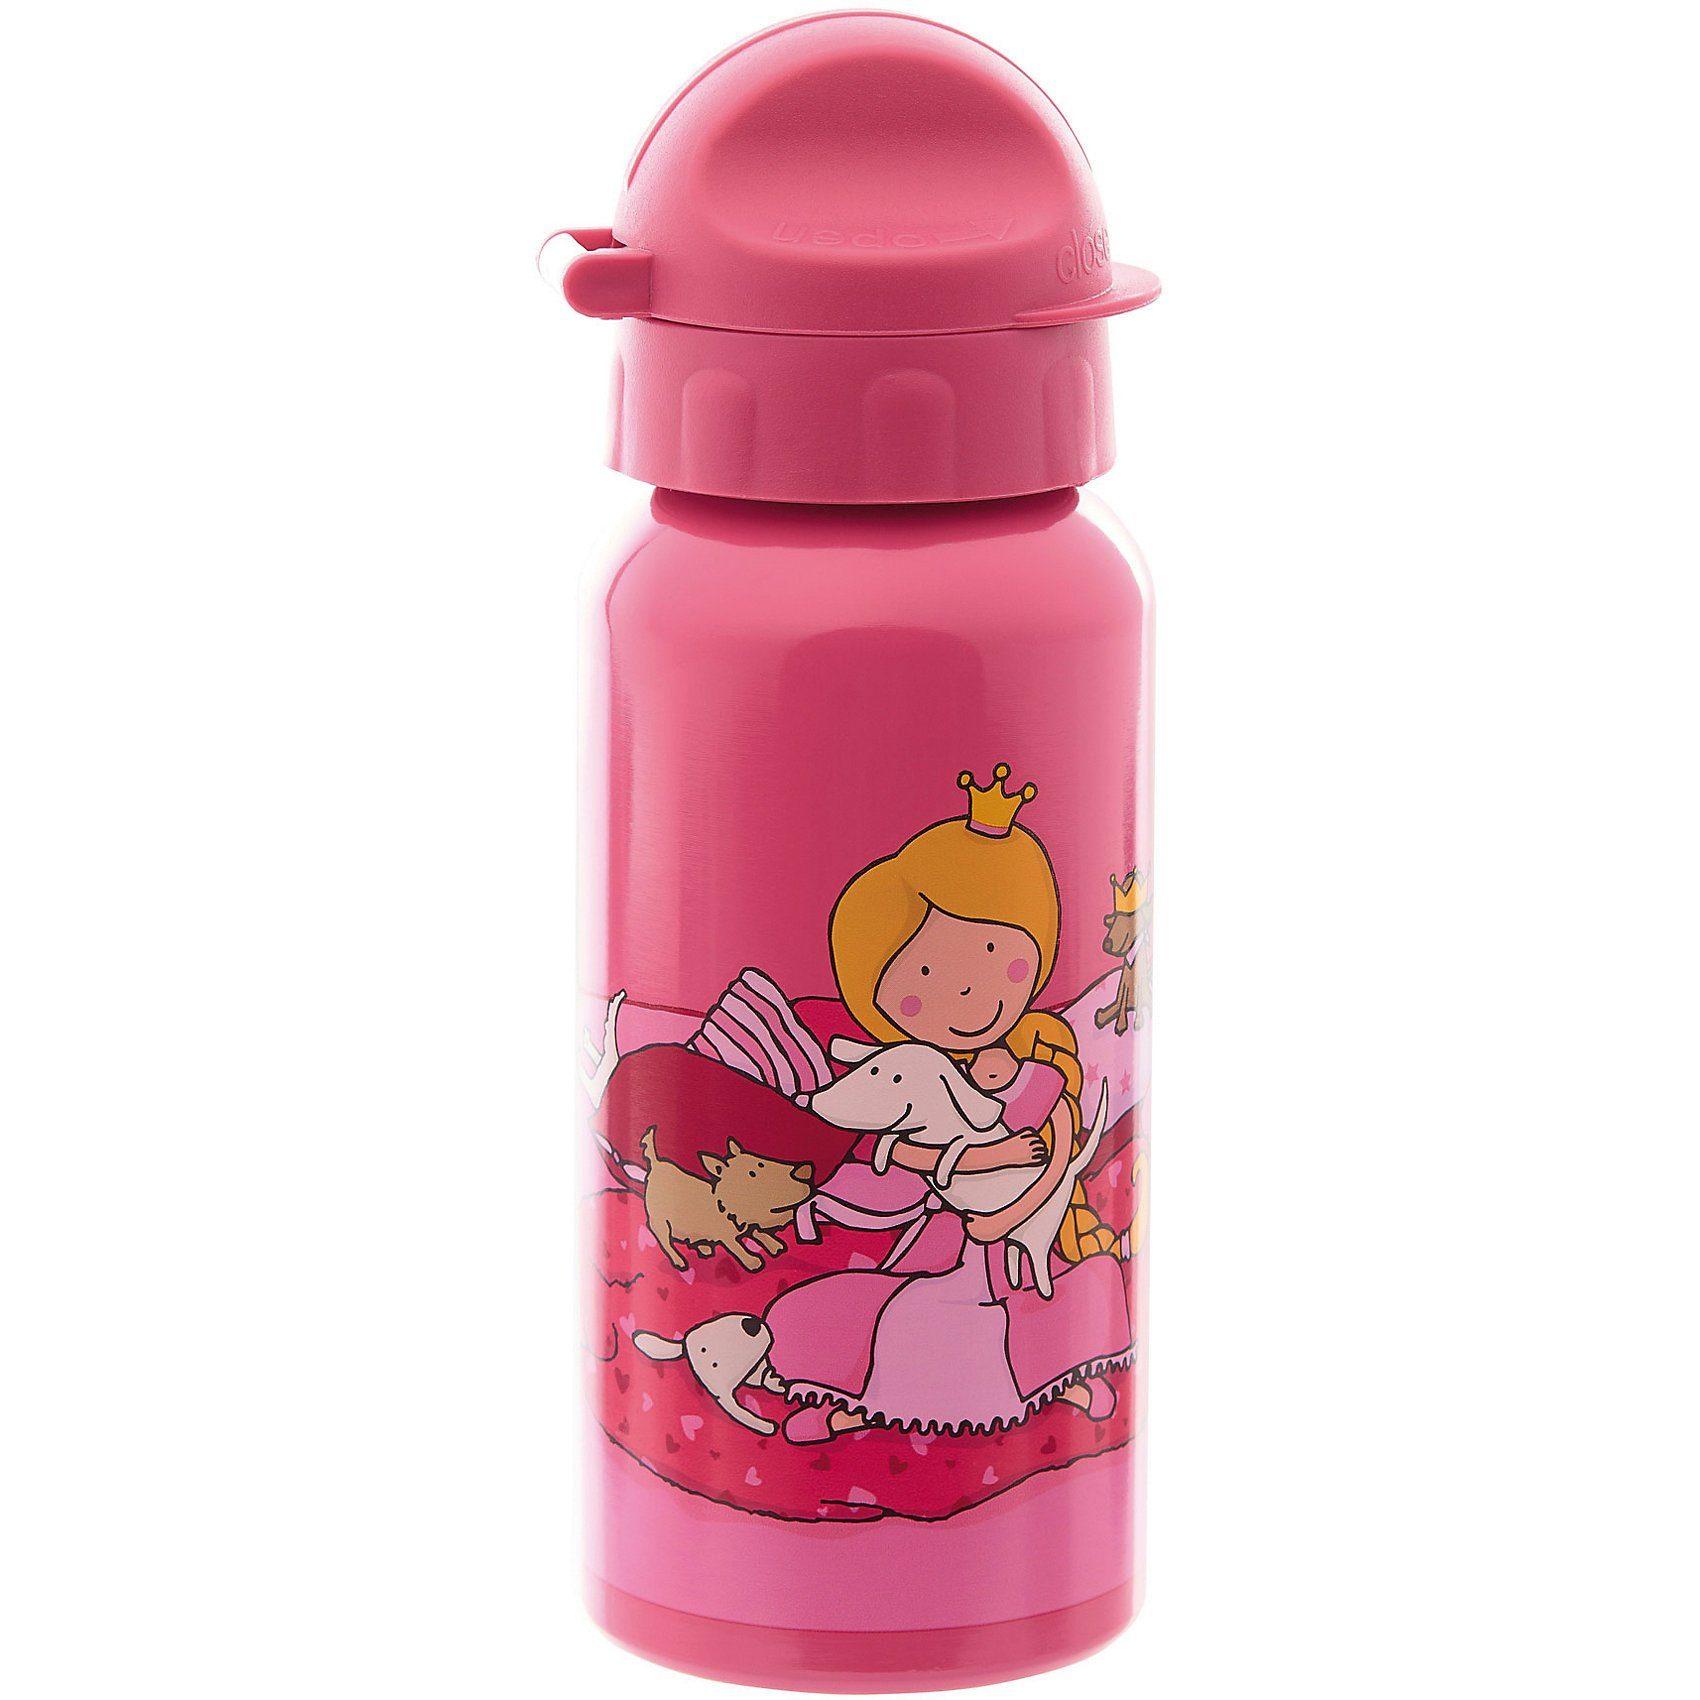 Sigikid Trinkflasche Pinky Queeny, 400ml